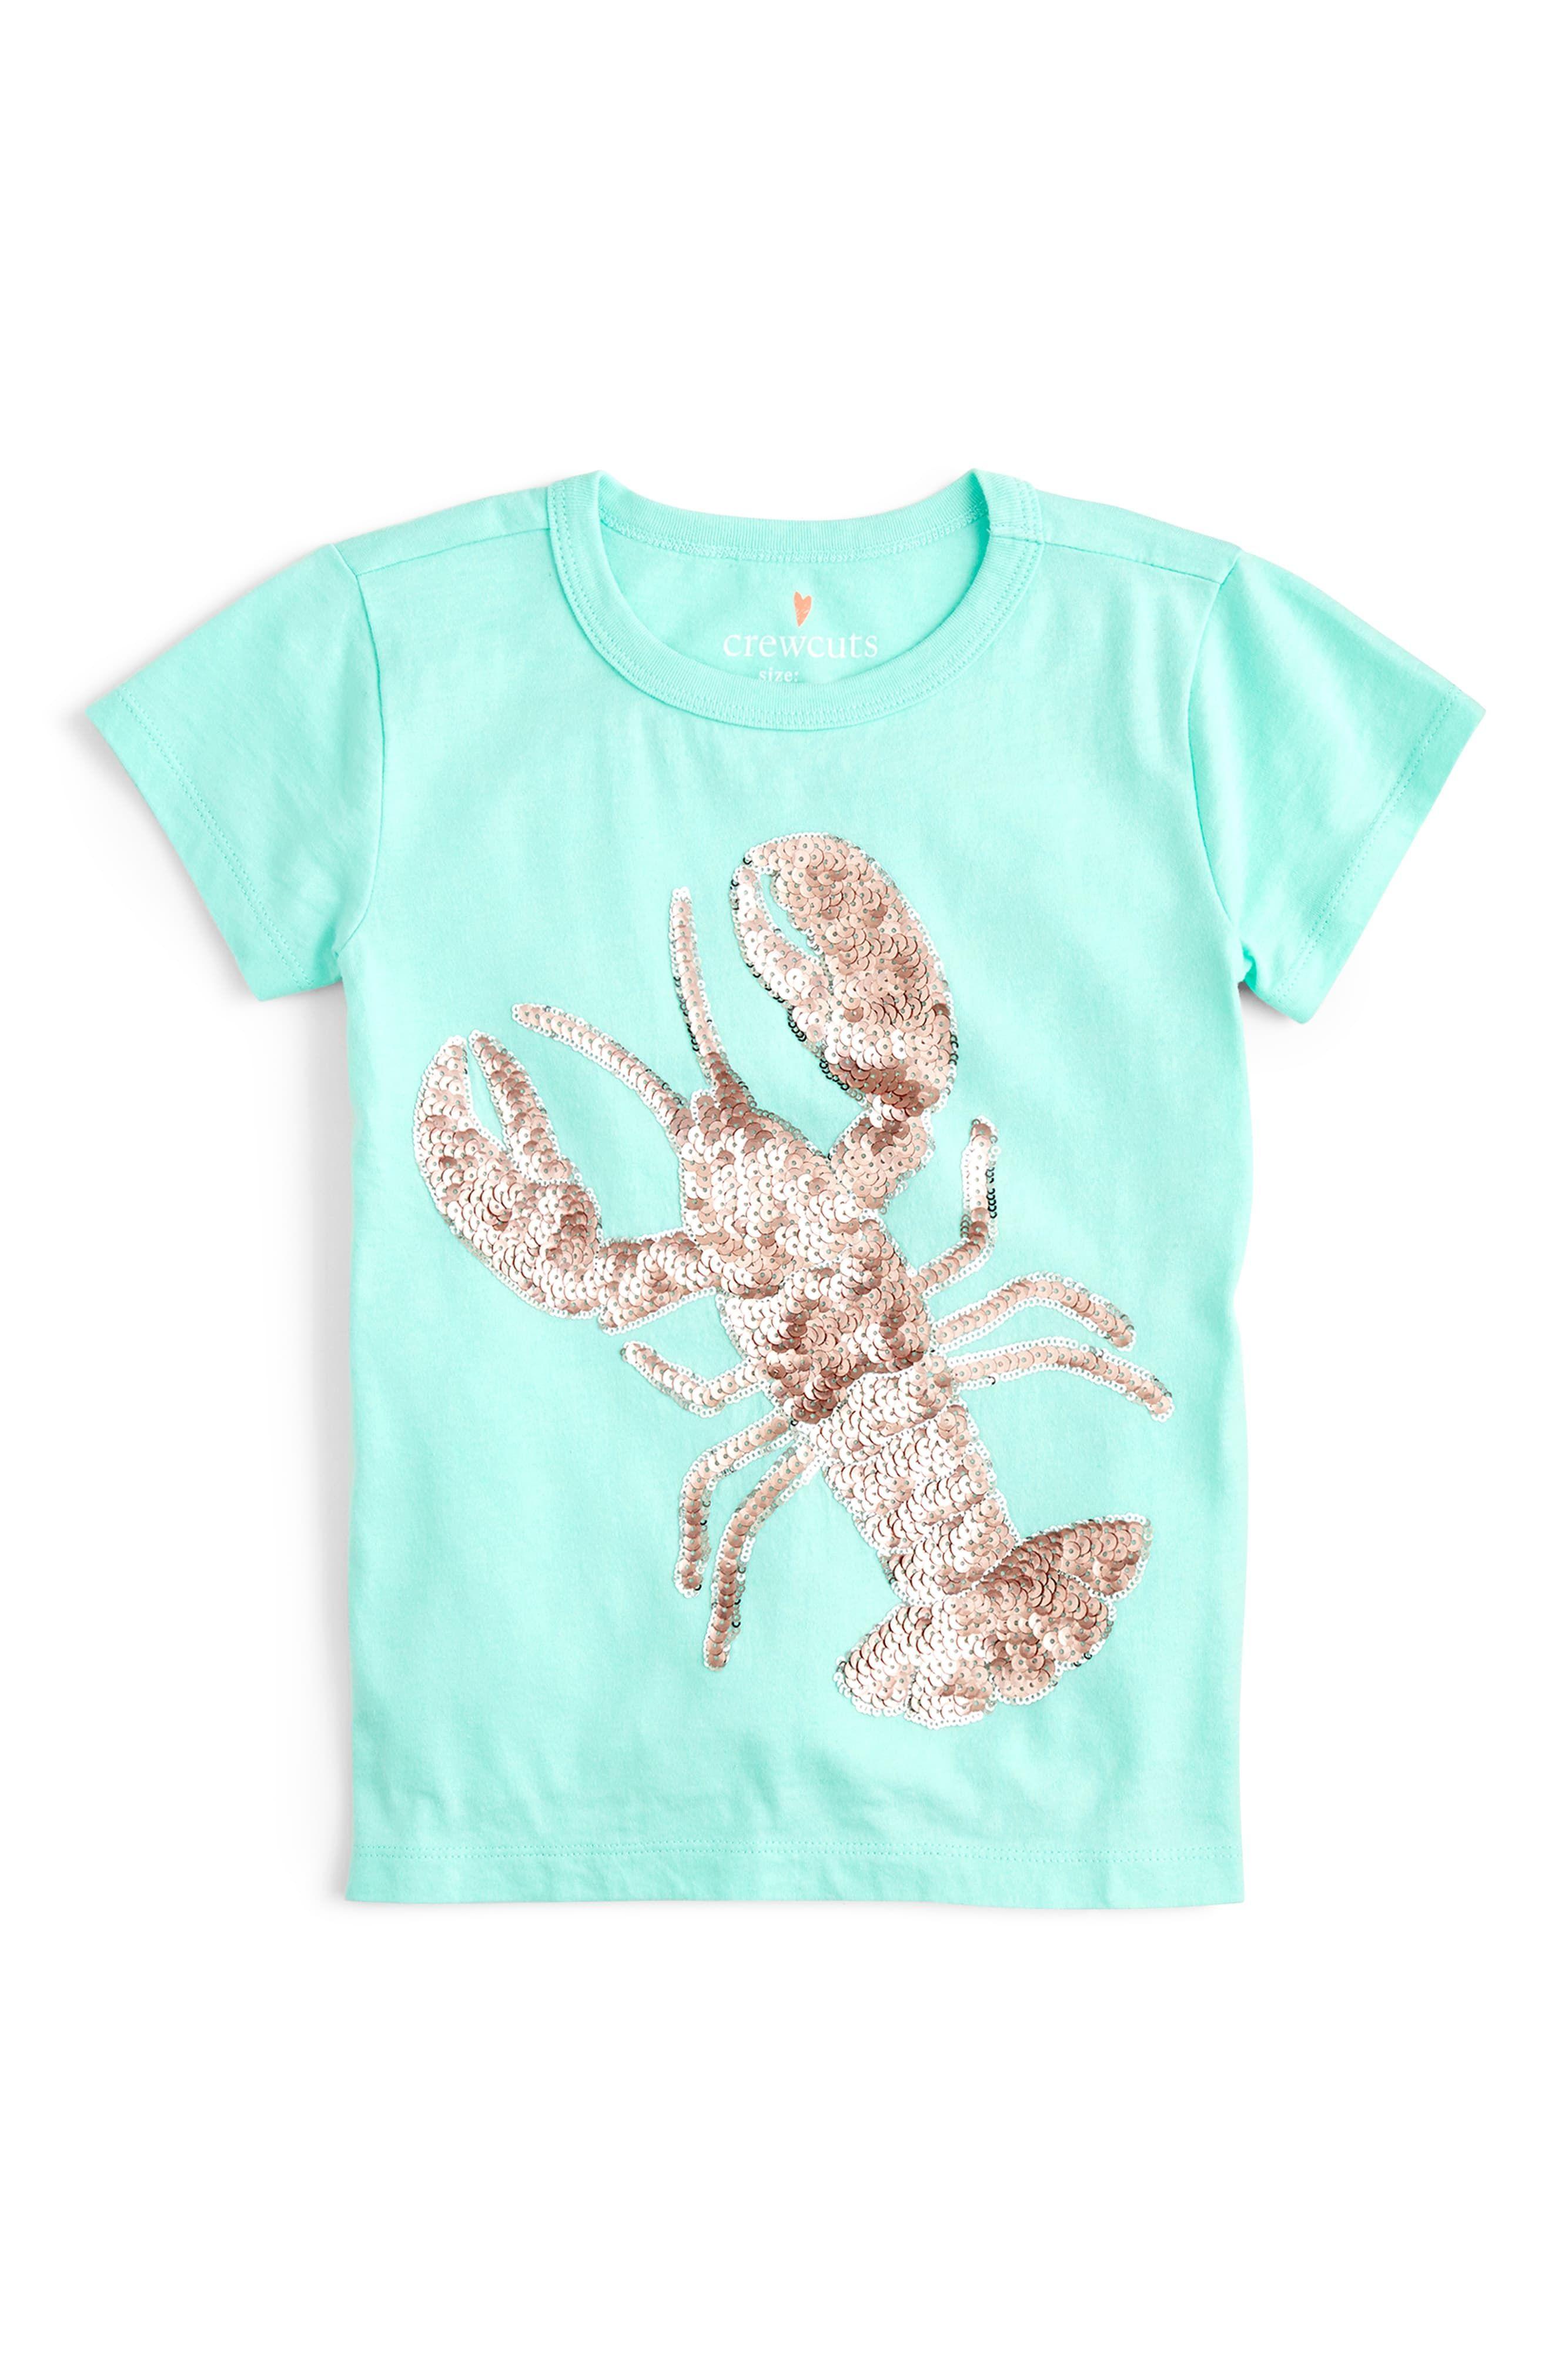 J By Jasper Conran Kids Boys/' Light Blue Lobster Stripe Swim Shorts